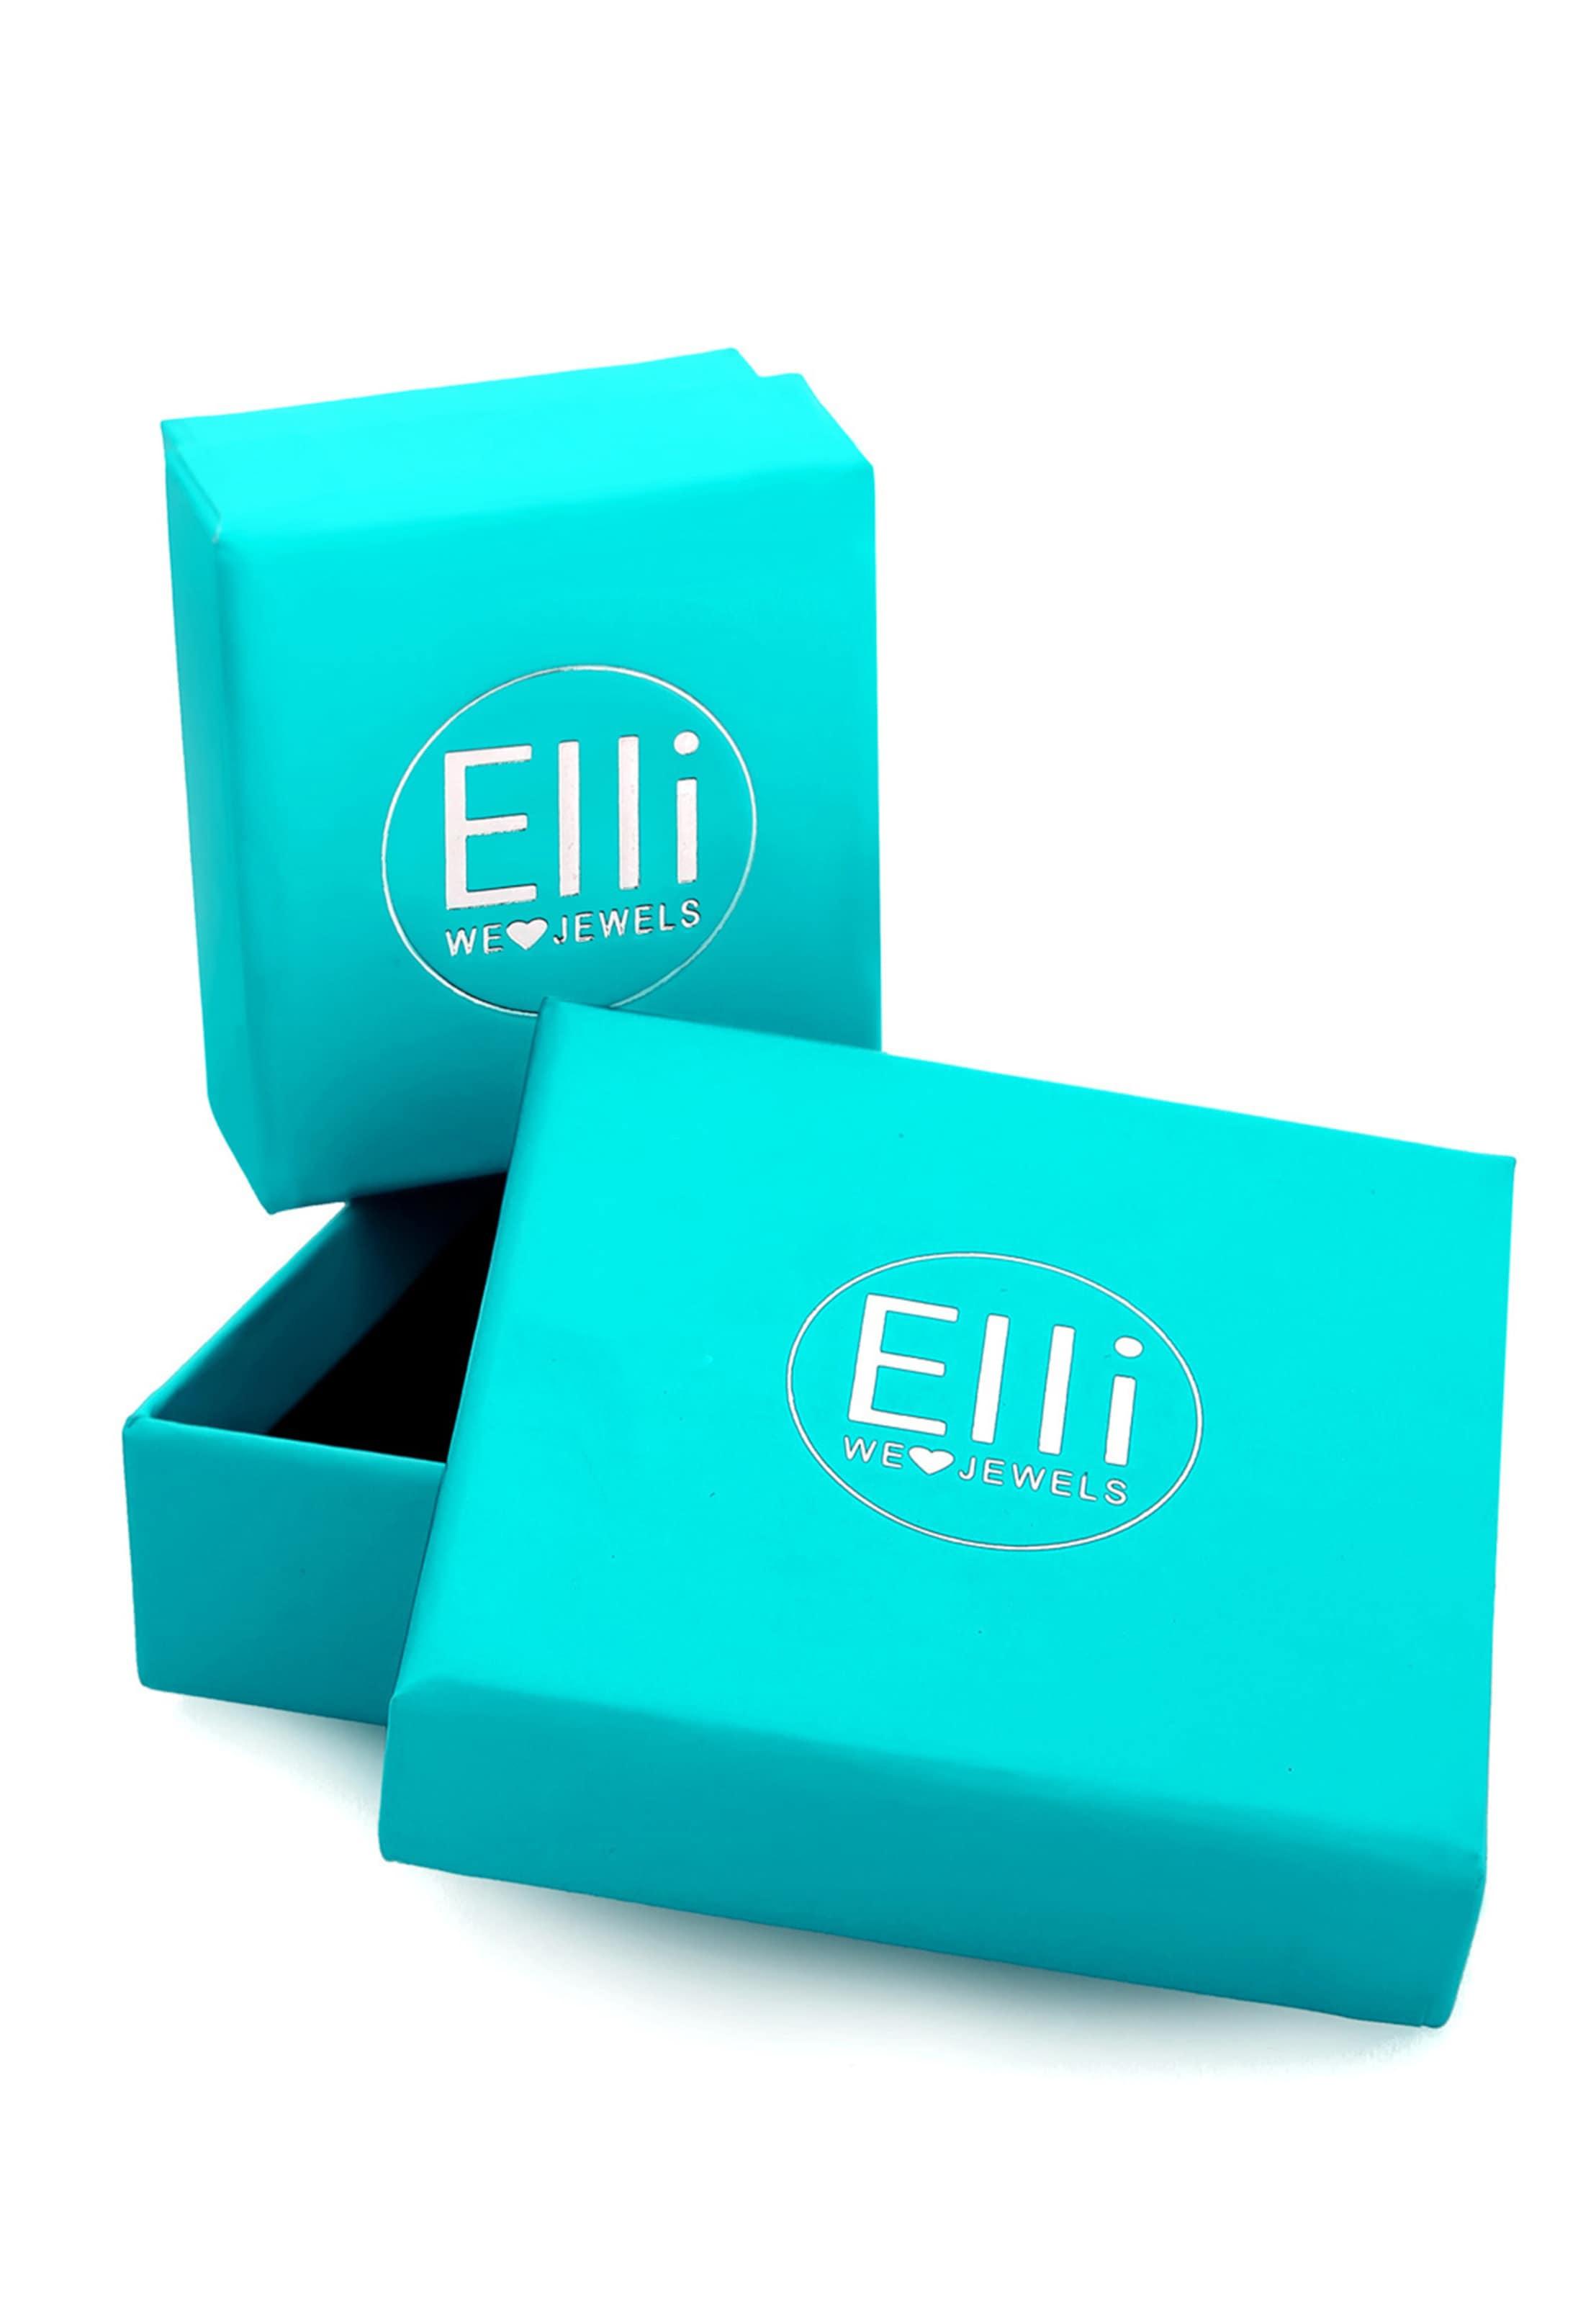 Elli Elli Premium En Bague Elli Premium Bague Argent En Argent u1JTlFc3K